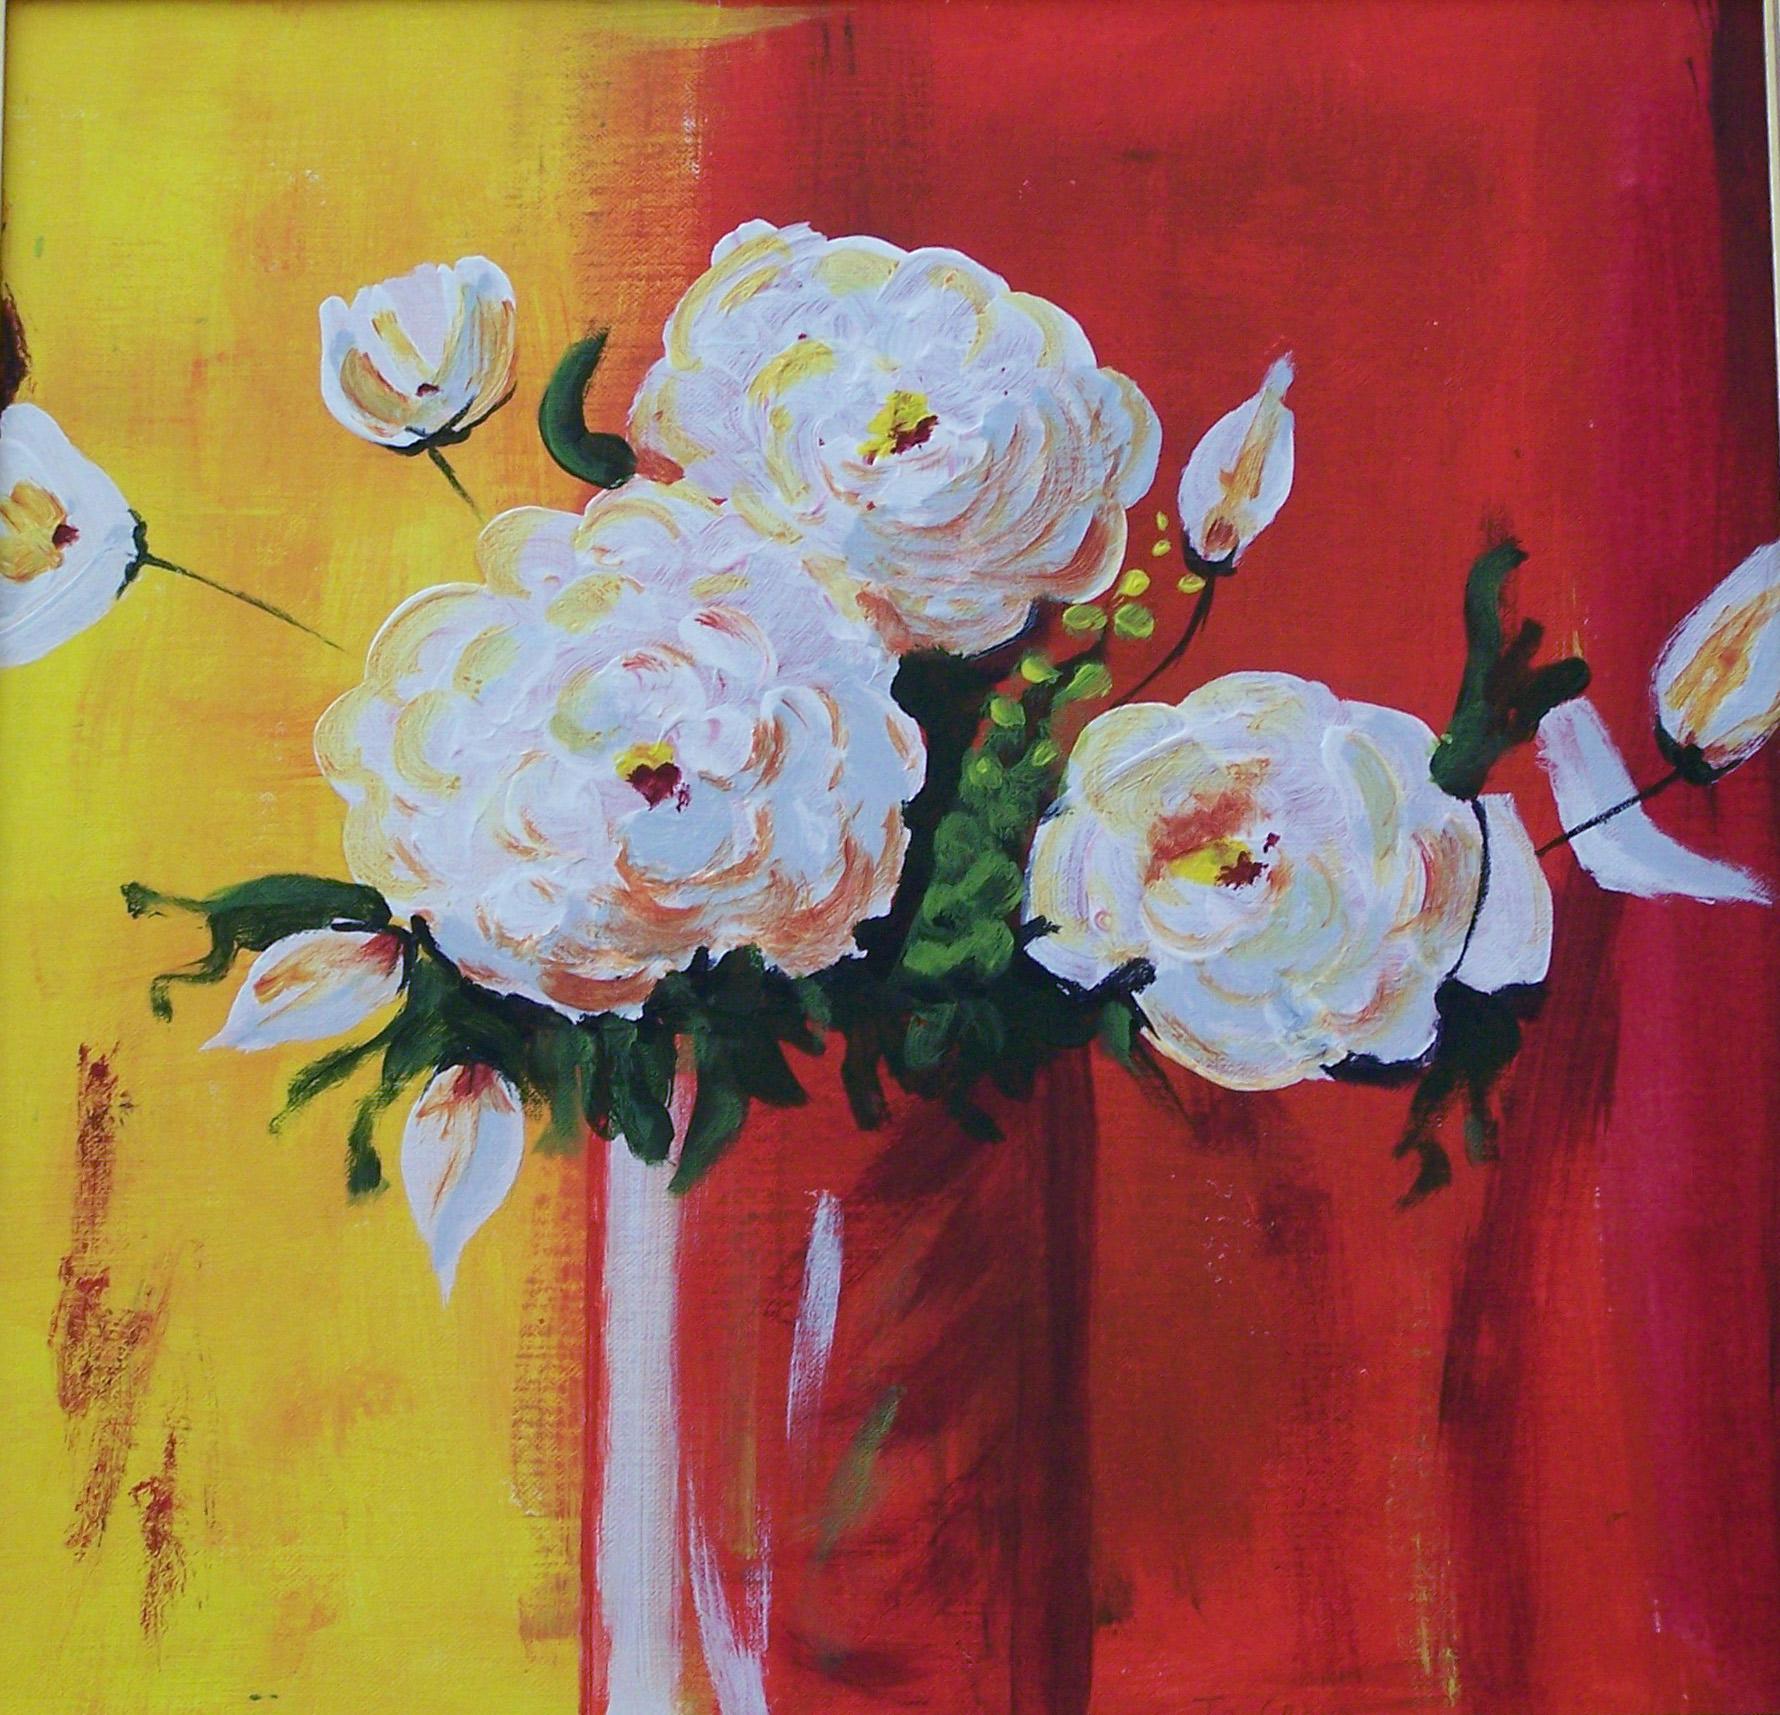 719- ROSES FOR MARETHA